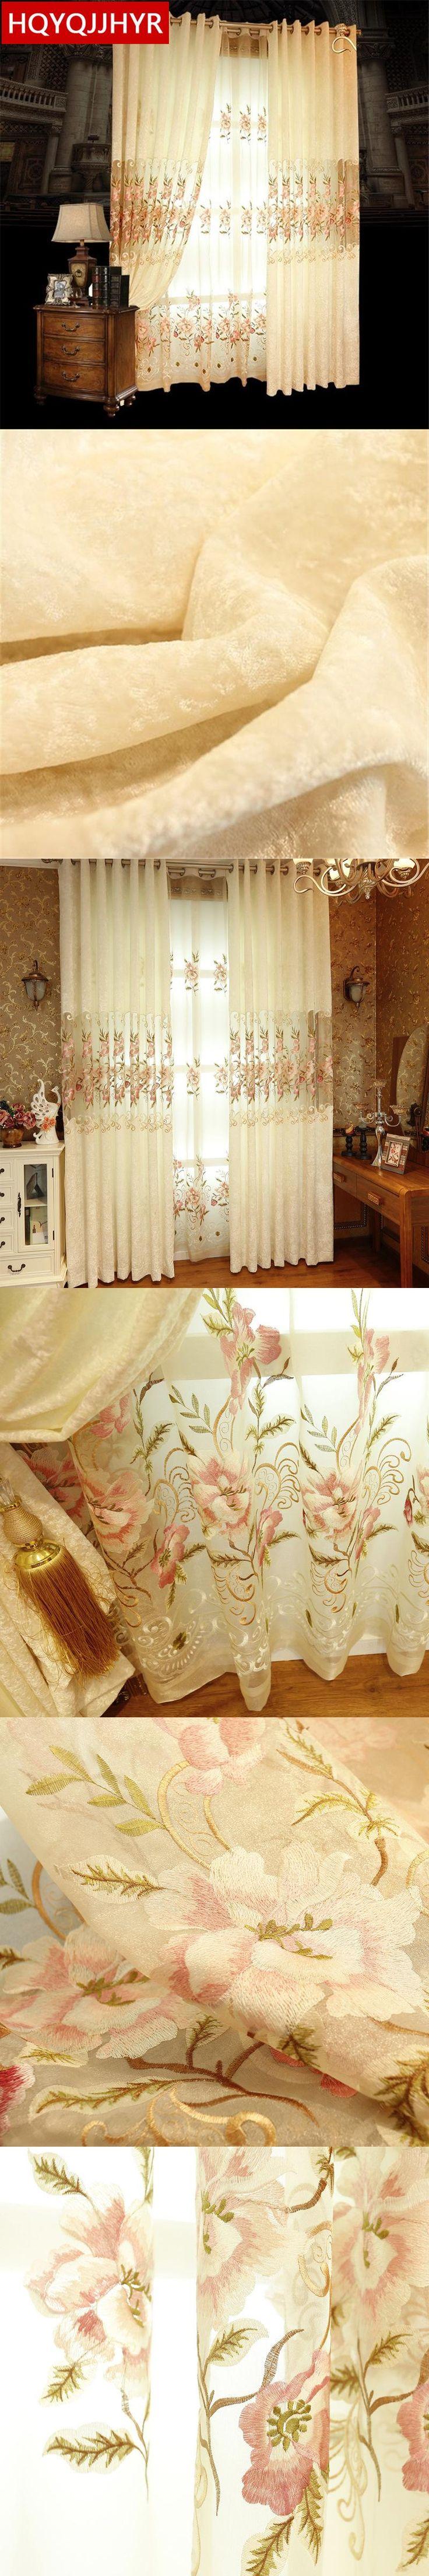 Best 25+ High curtains ideas on Pinterest | Curtains, Window ...